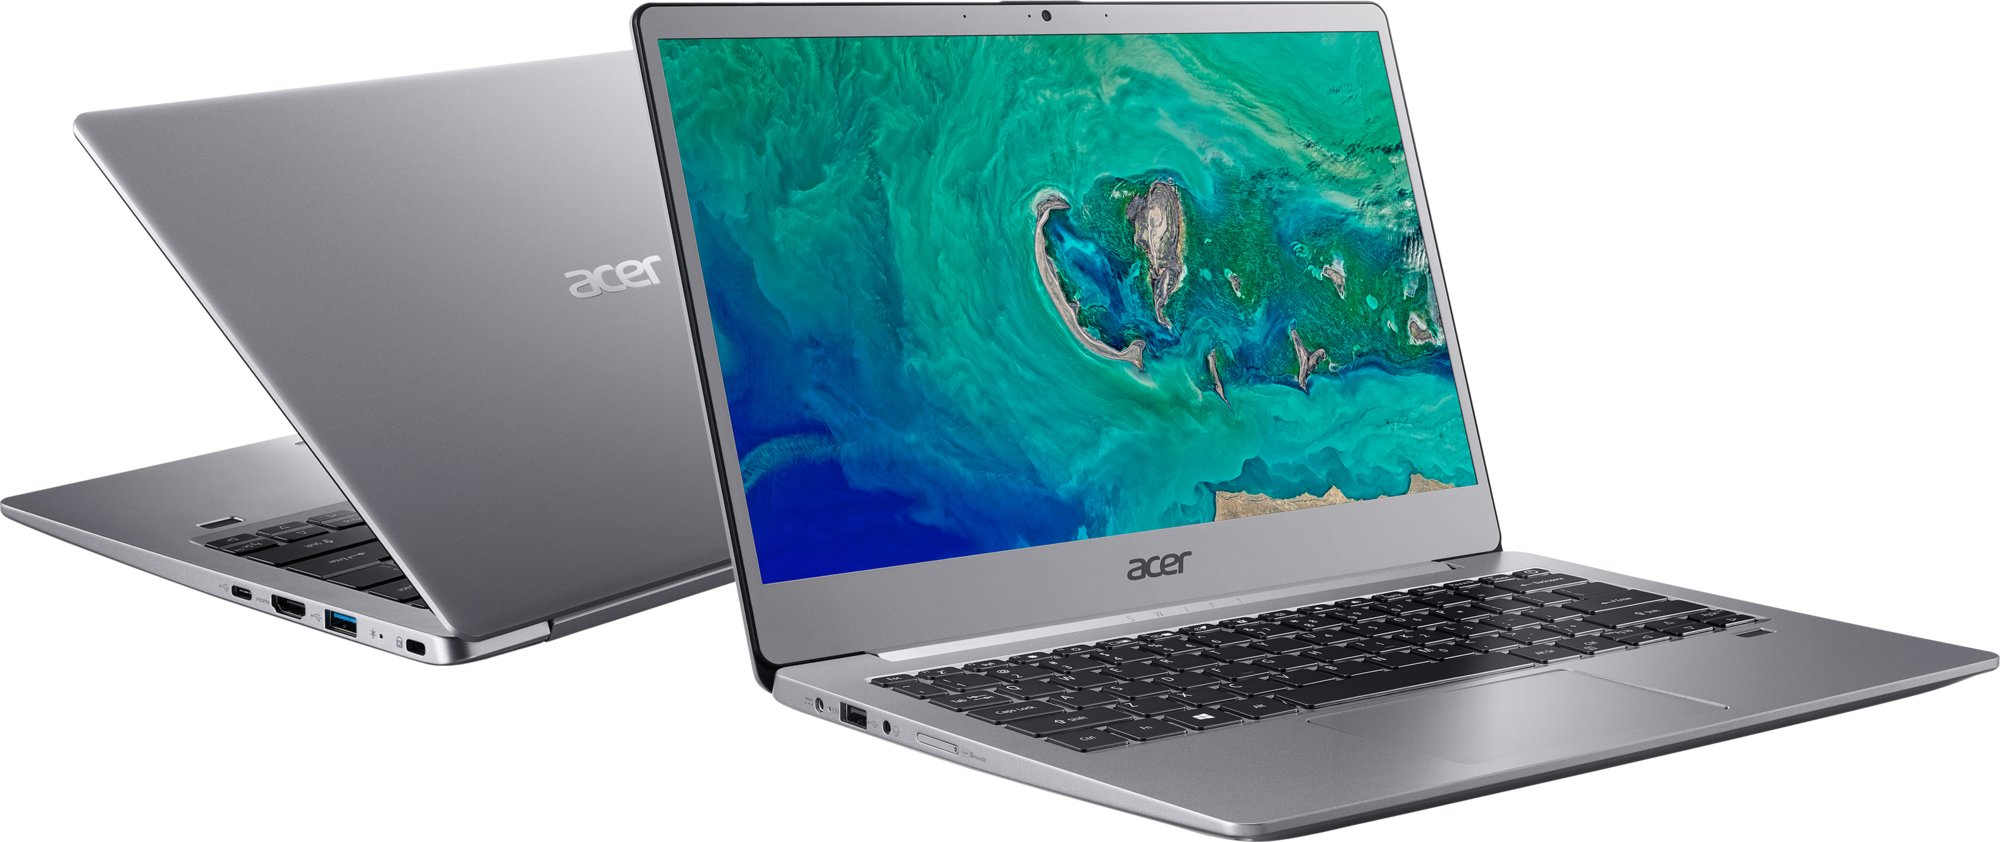 Acer Swift 3 SF313-51-59SZ